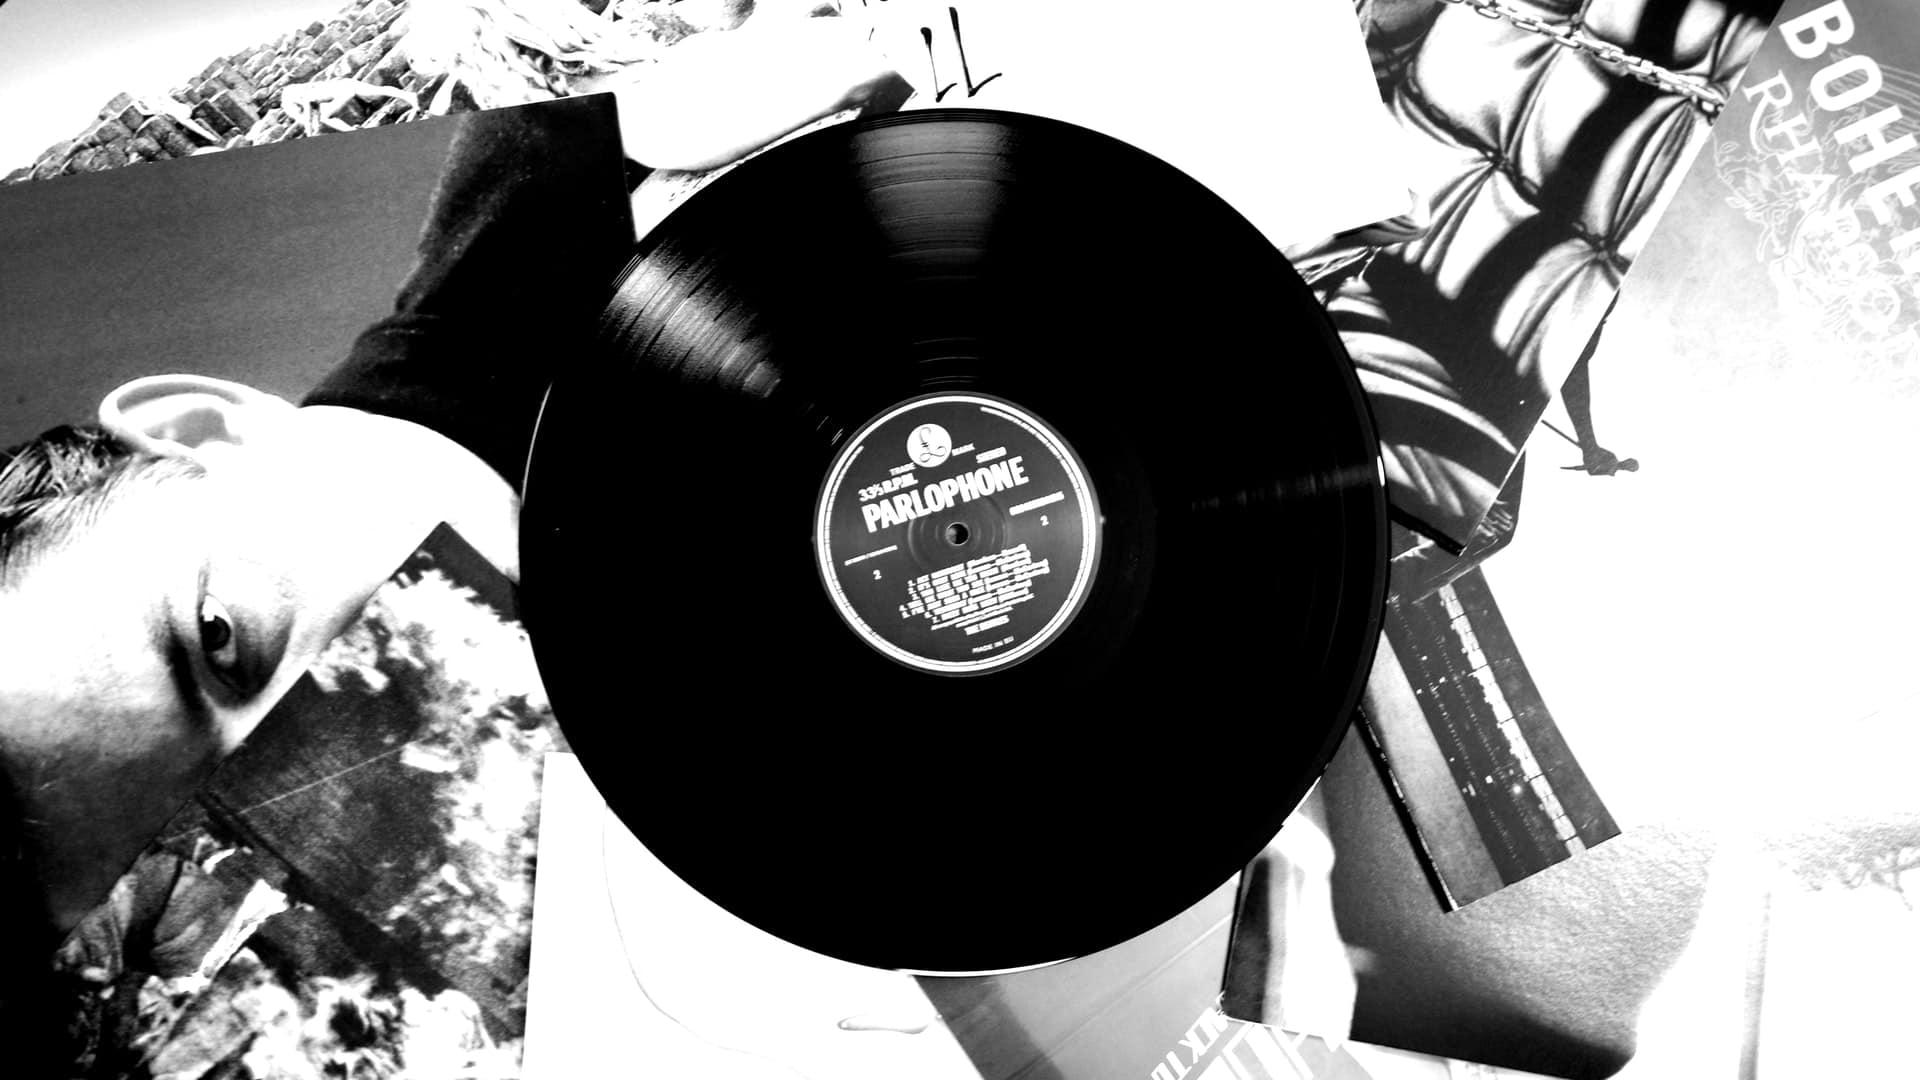 denis-oliveira-eUu46AFV1f0-unsplash-minのアイキャッチ画像